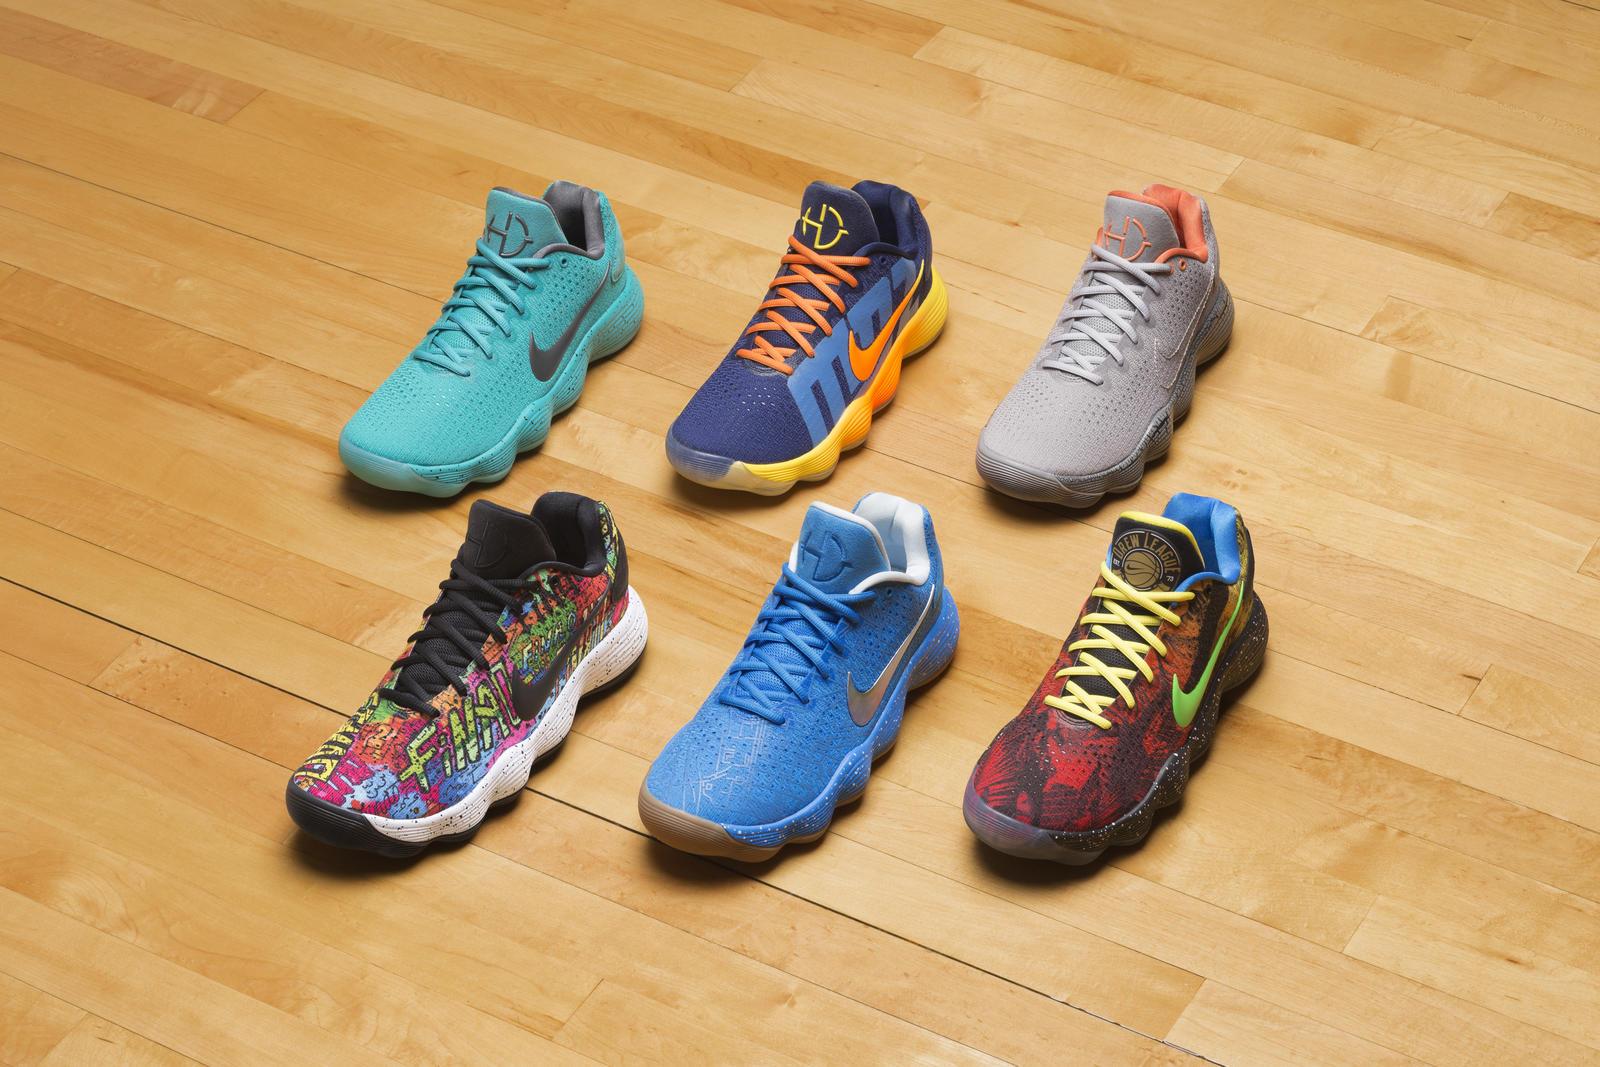 24577553e6b7 Six New Nike Hyperdunk Low Styles Celebrate Basketball s Global ...